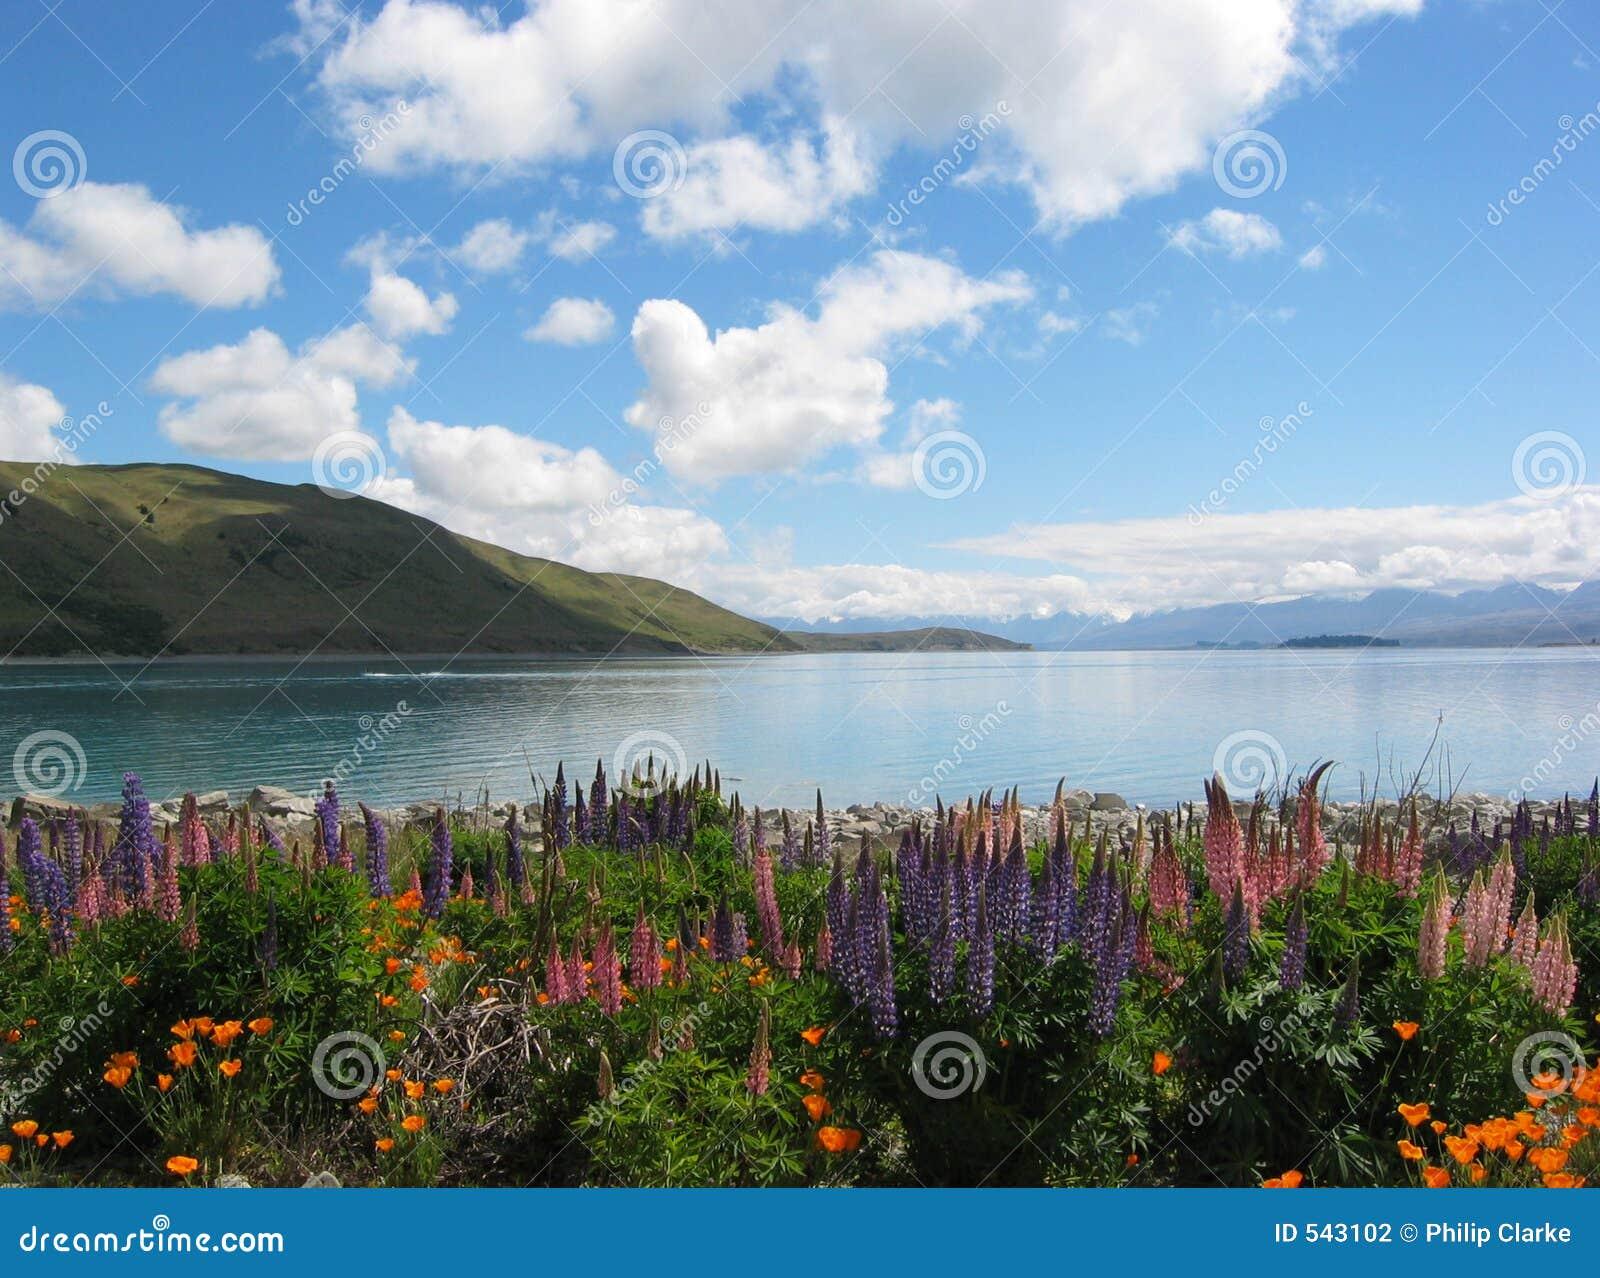 Download 在花湖附近 库存照片. 图片 包括有 本质, 横向, 西兰, 海岛, 夏天, 云彩, 羽扇豆, 天空 - 543102